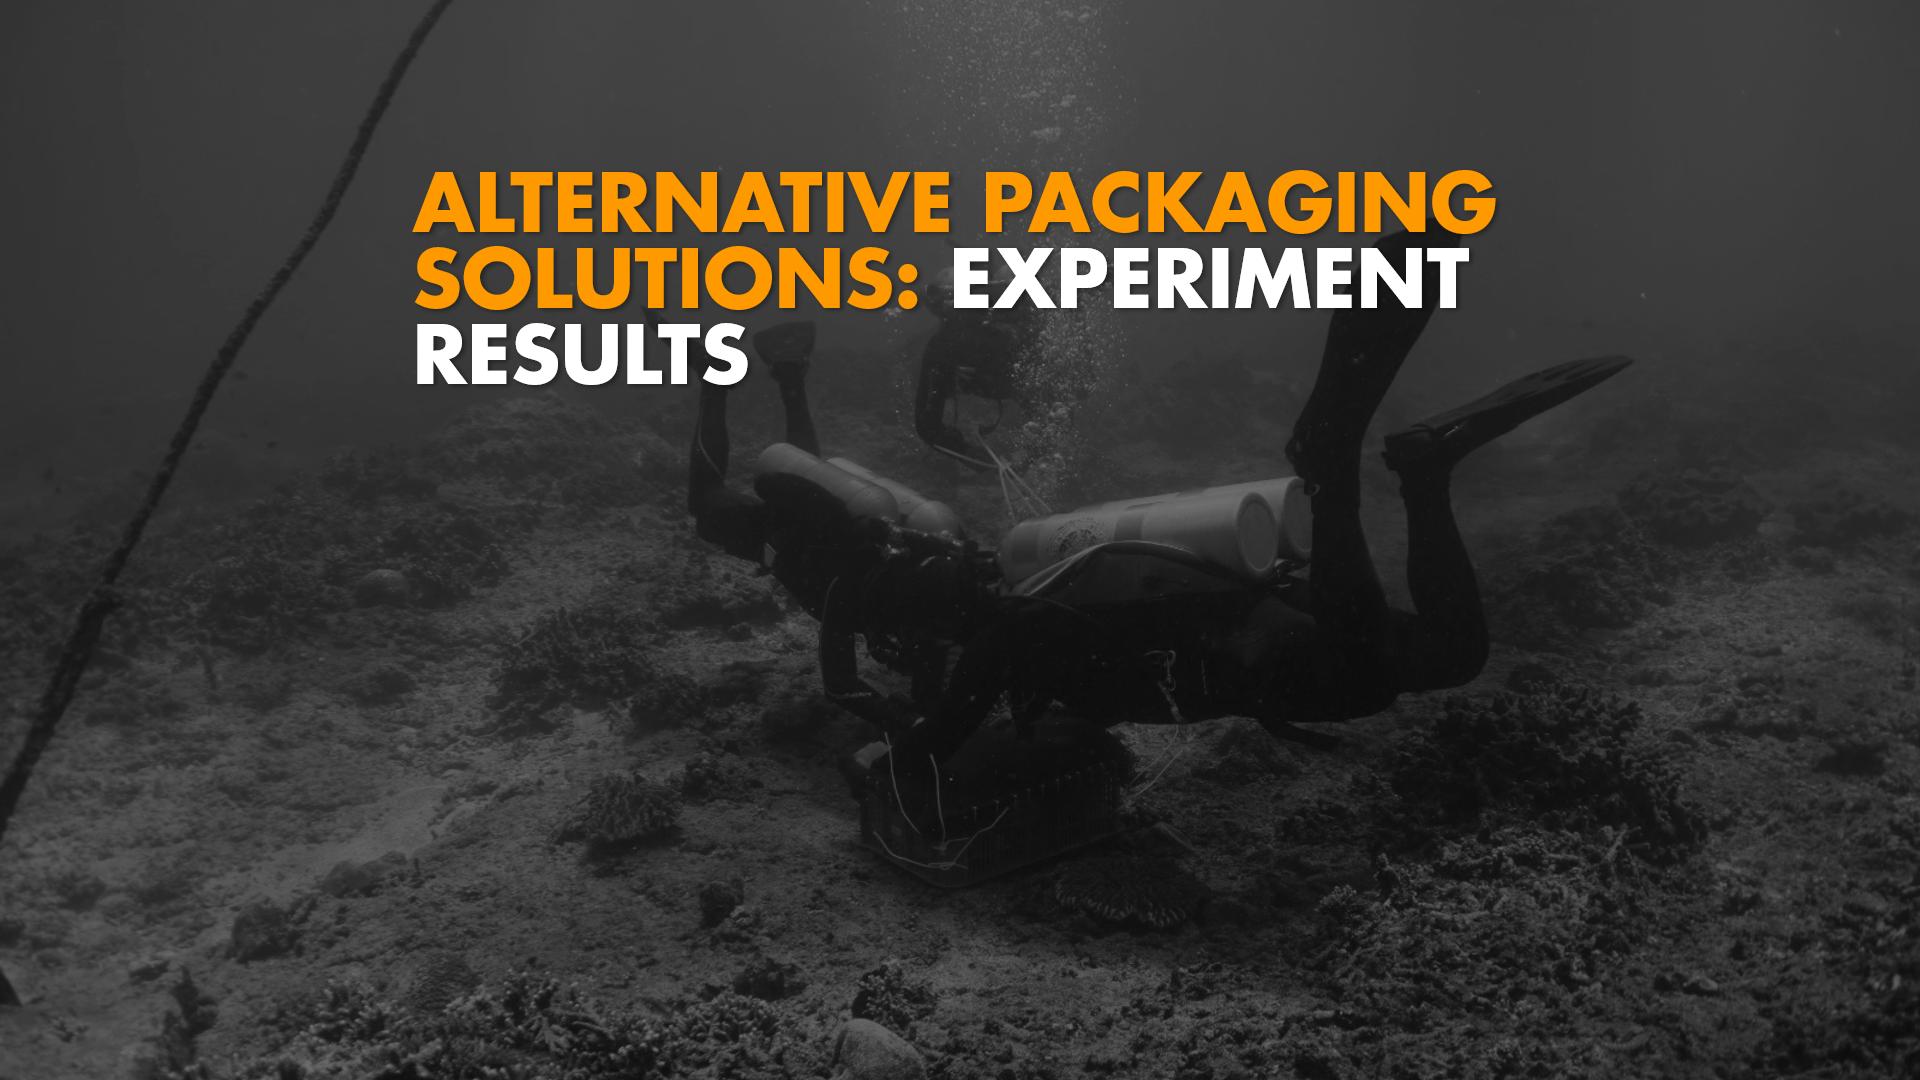 Alternative Packaging Report